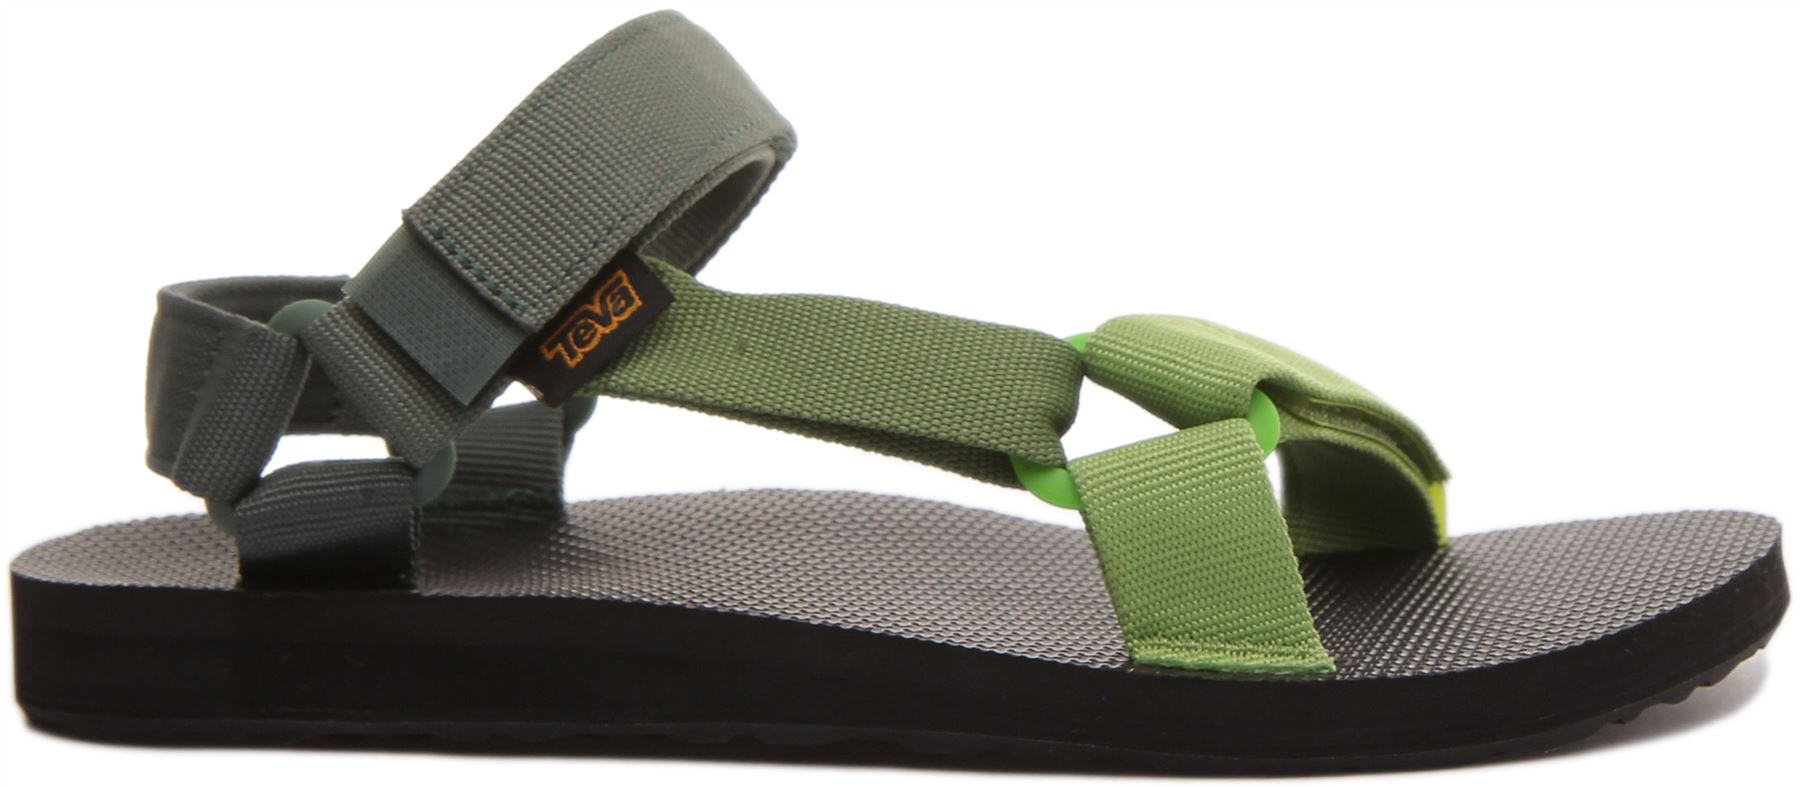 miniatura 8 - Teva Original Universal Da Uomo Con Cinturino Sandalo in Verde Taglia UK 6 - 12